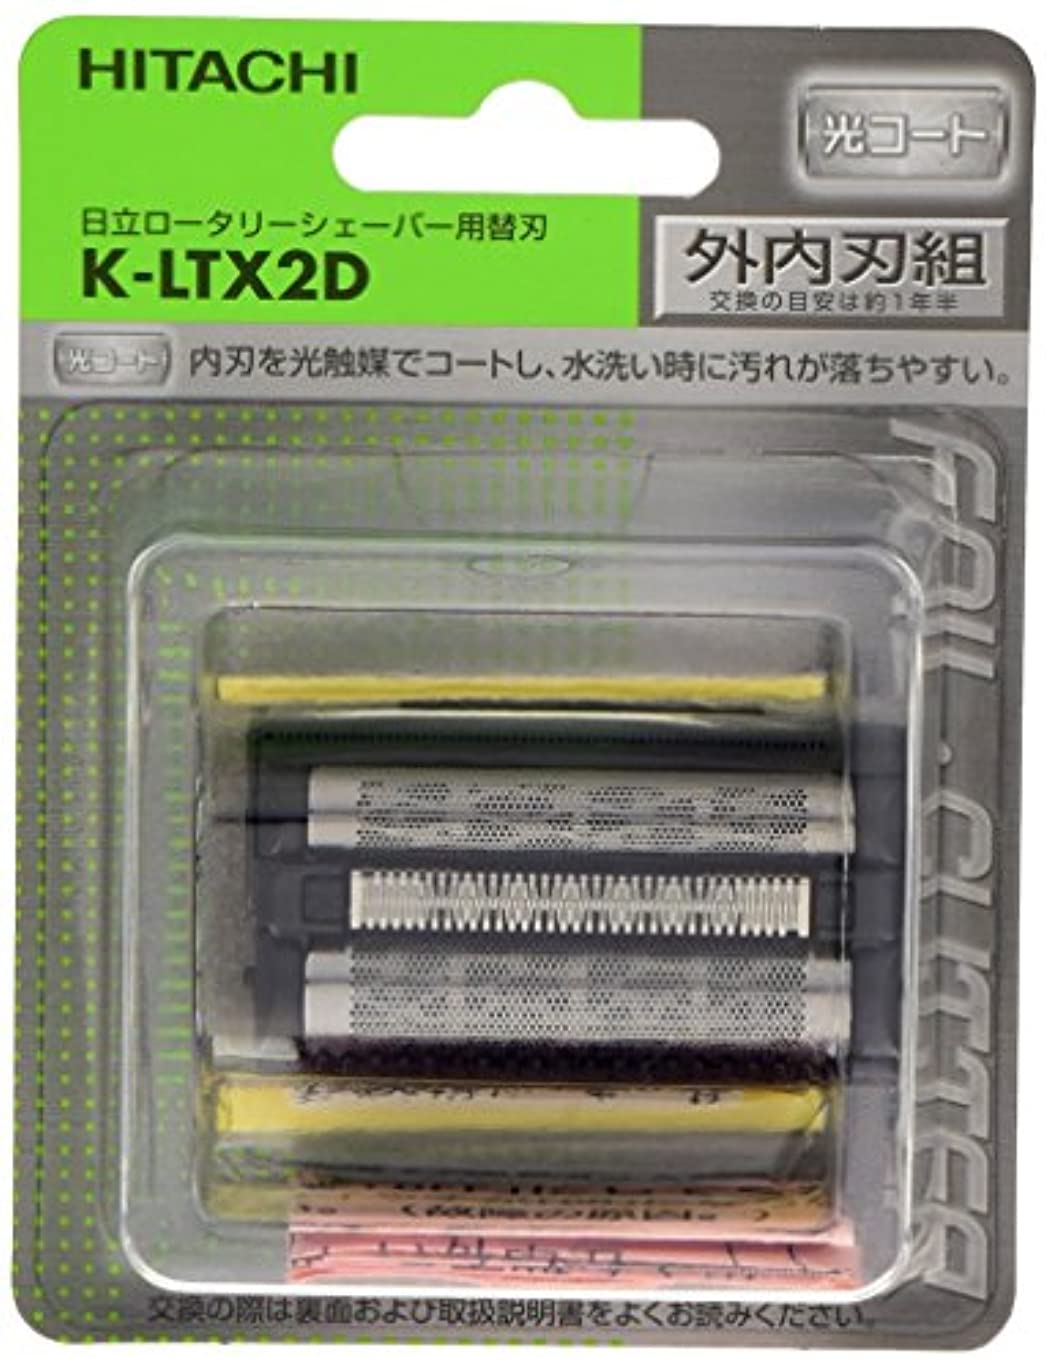 名誉幻滅キャプチャー日立 替刃 外刃?内刃一体型 K-LTX2D